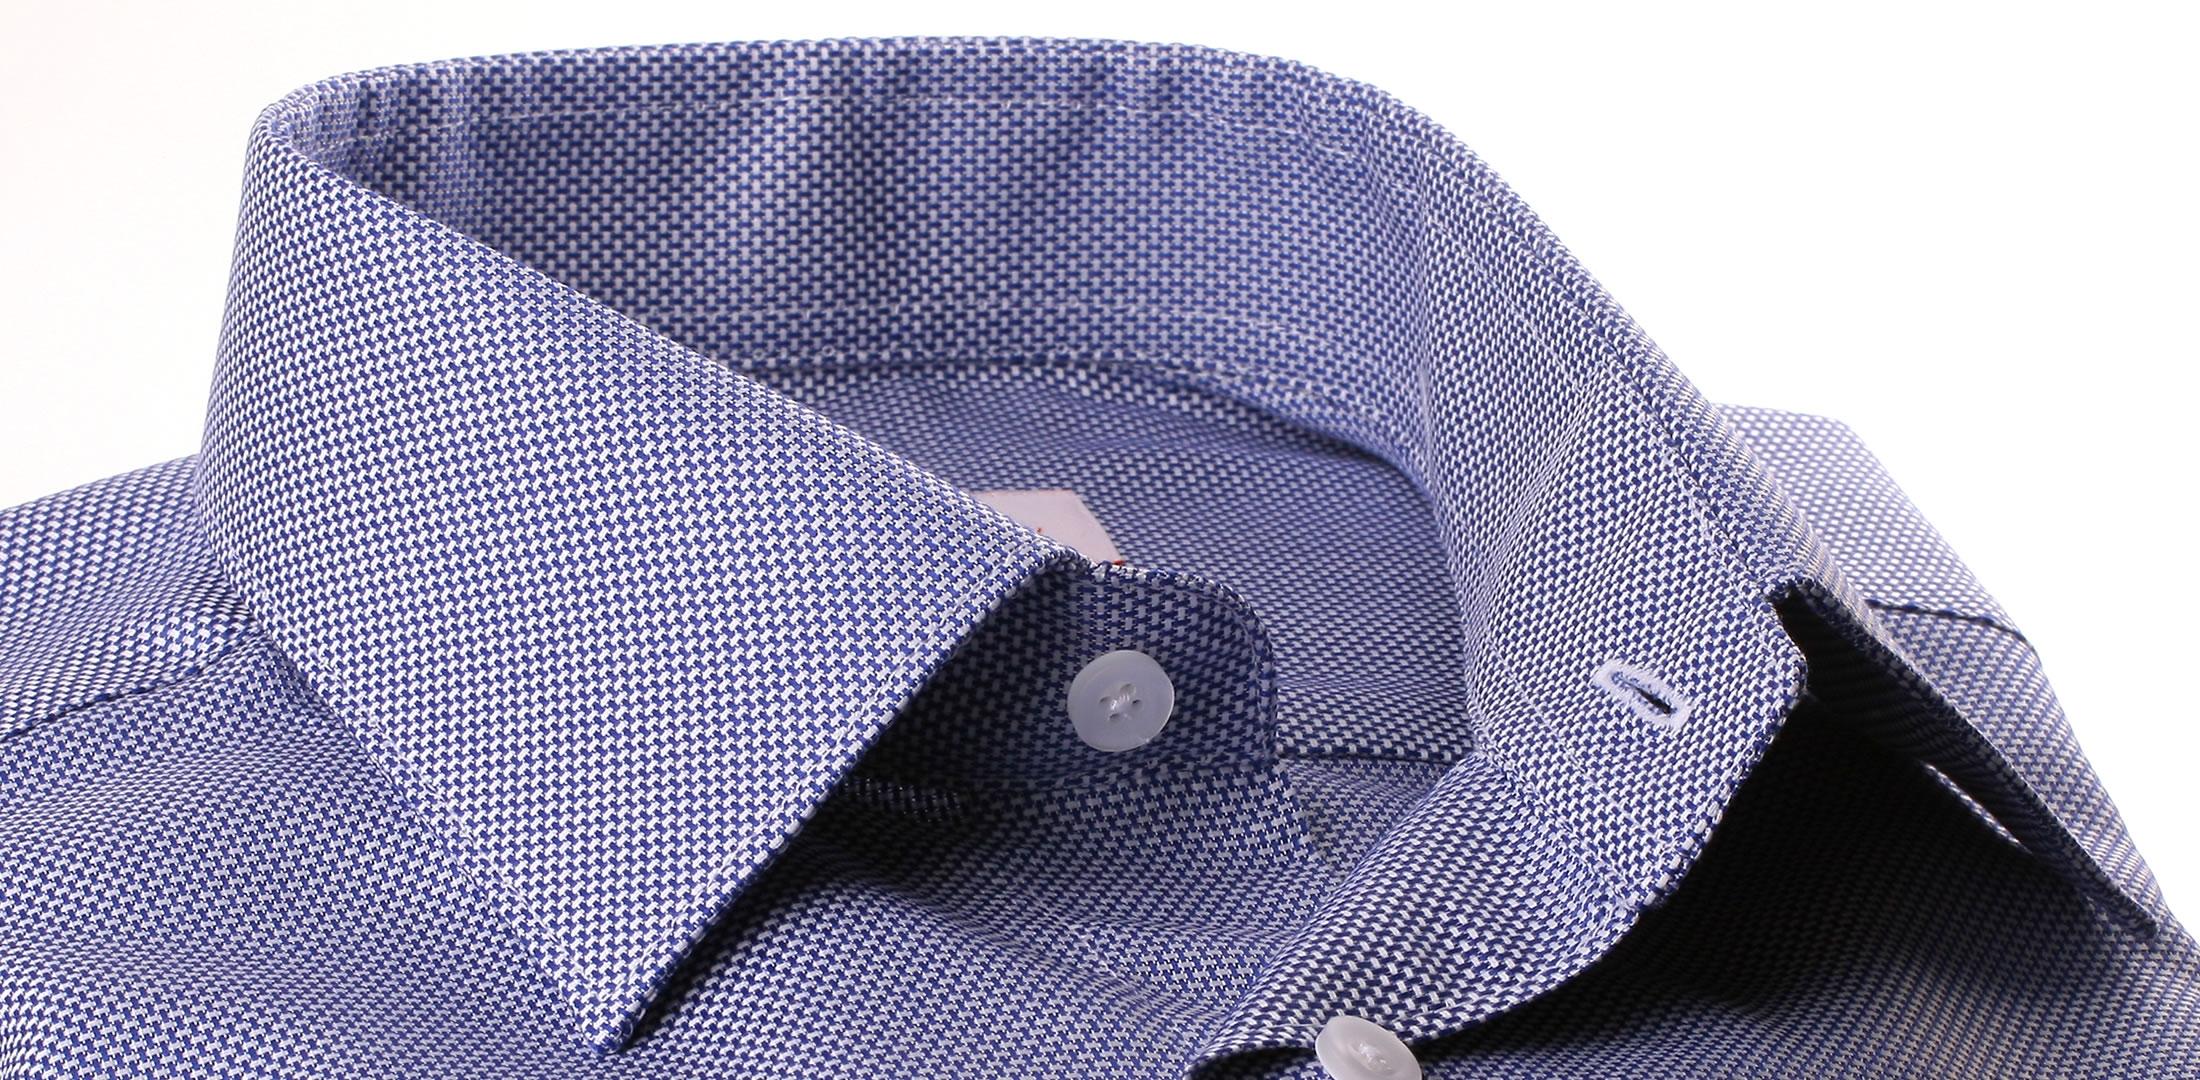 chemise tissu natt blanc et bleu marine. Black Bedroom Furniture Sets. Home Design Ideas